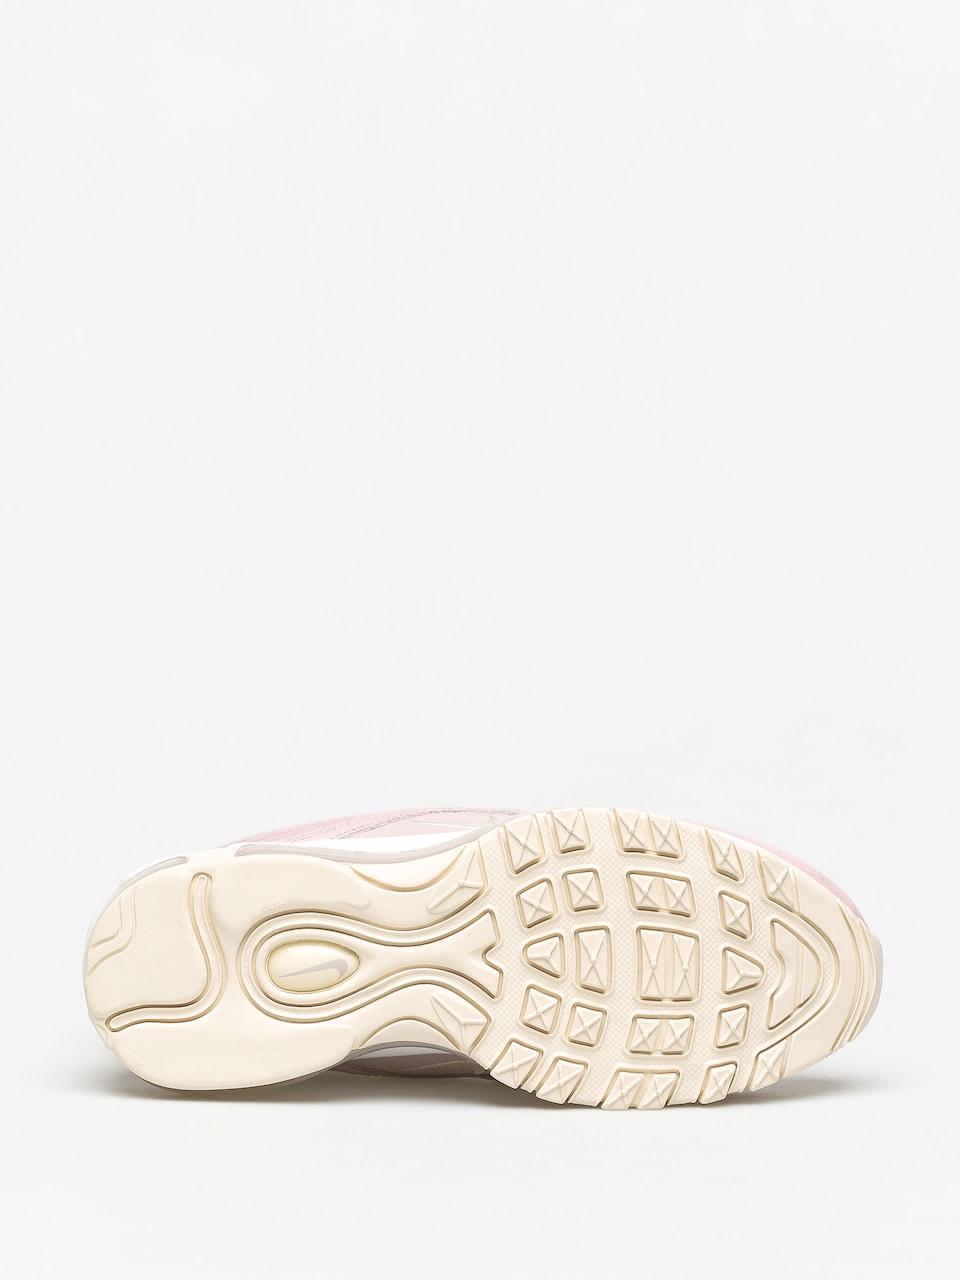 Buty Nike Air Max 97 Premium Wmn (plum chalklight cream particle rose)